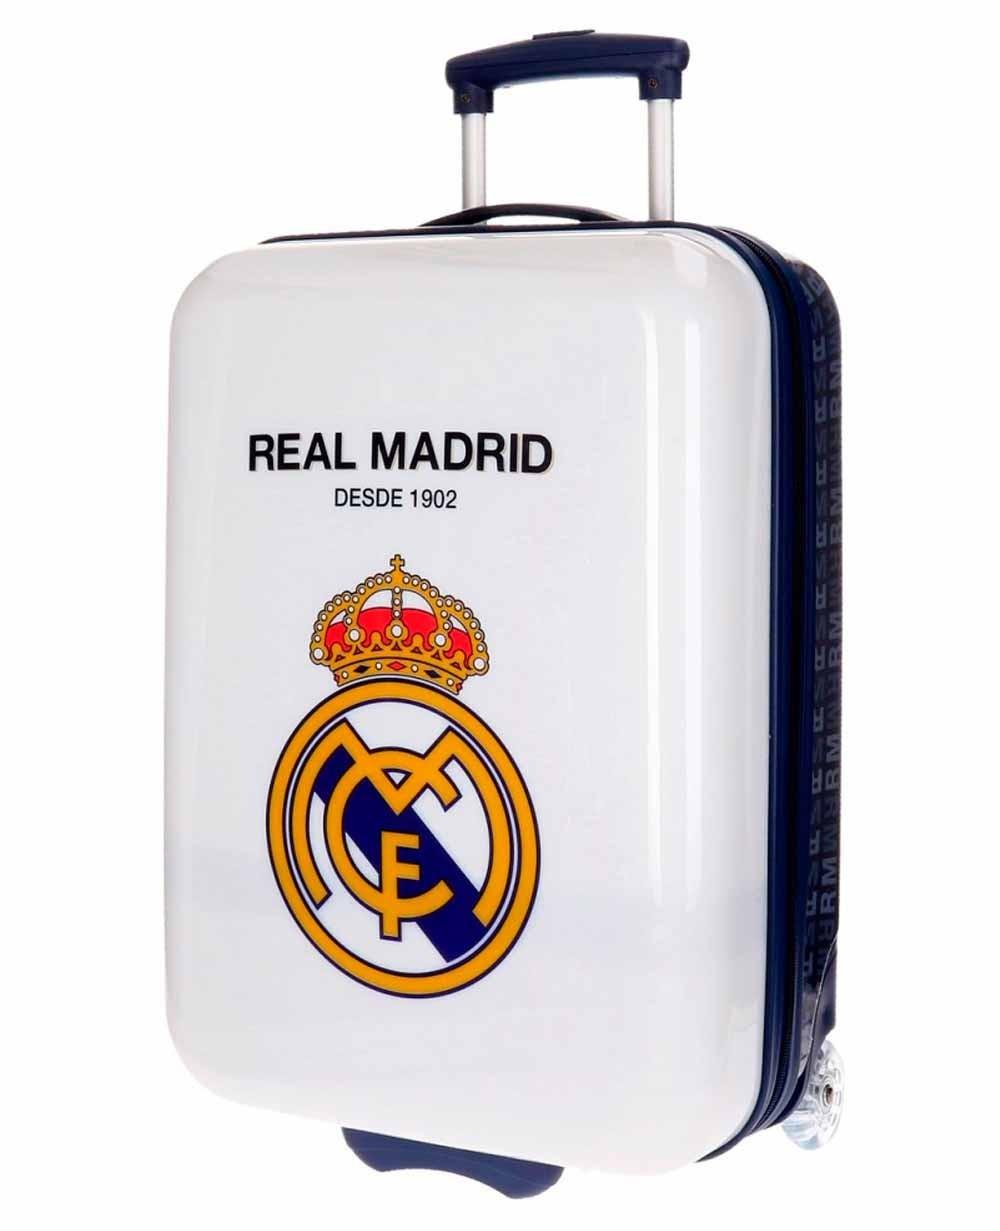 Real Madrid Hala Madrid Maleta de mano Blanca (Foto )